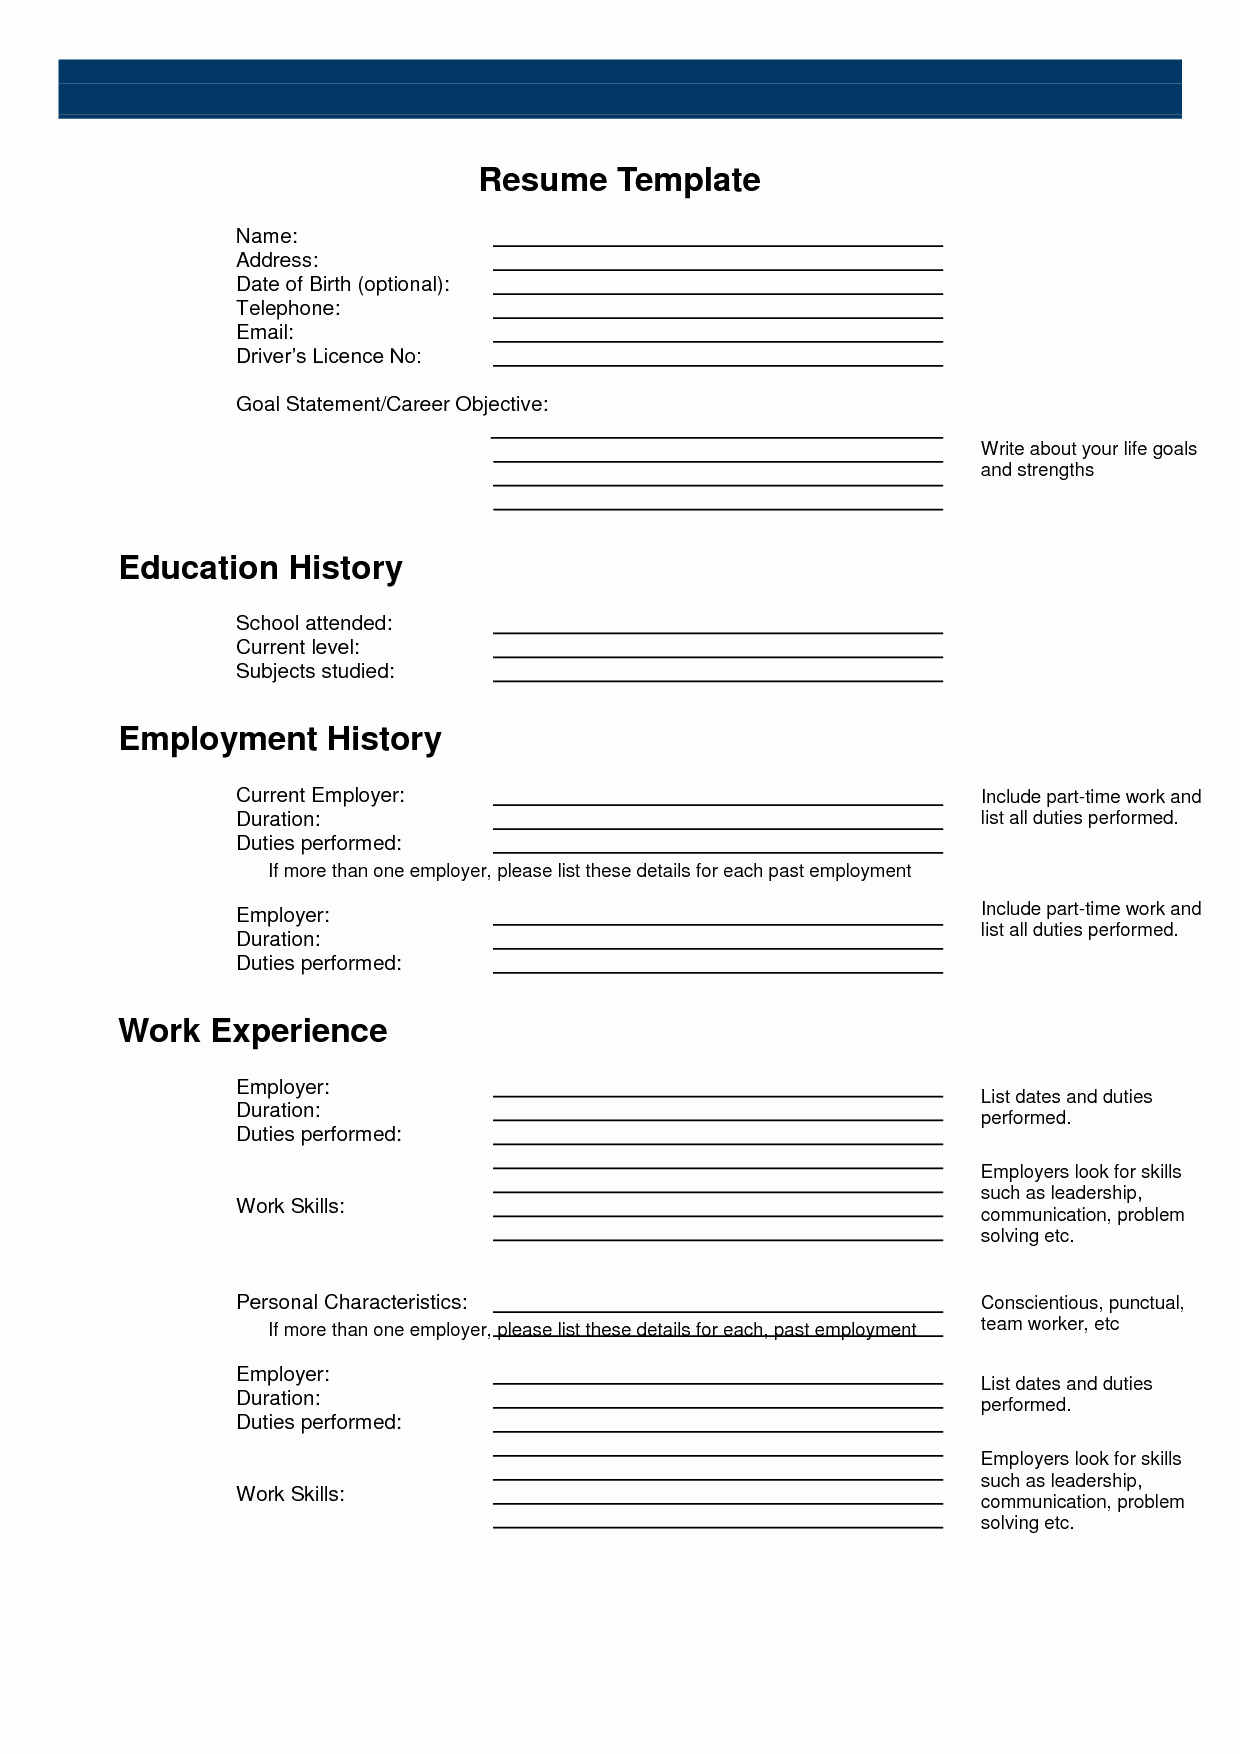 Free Resume Template Printable